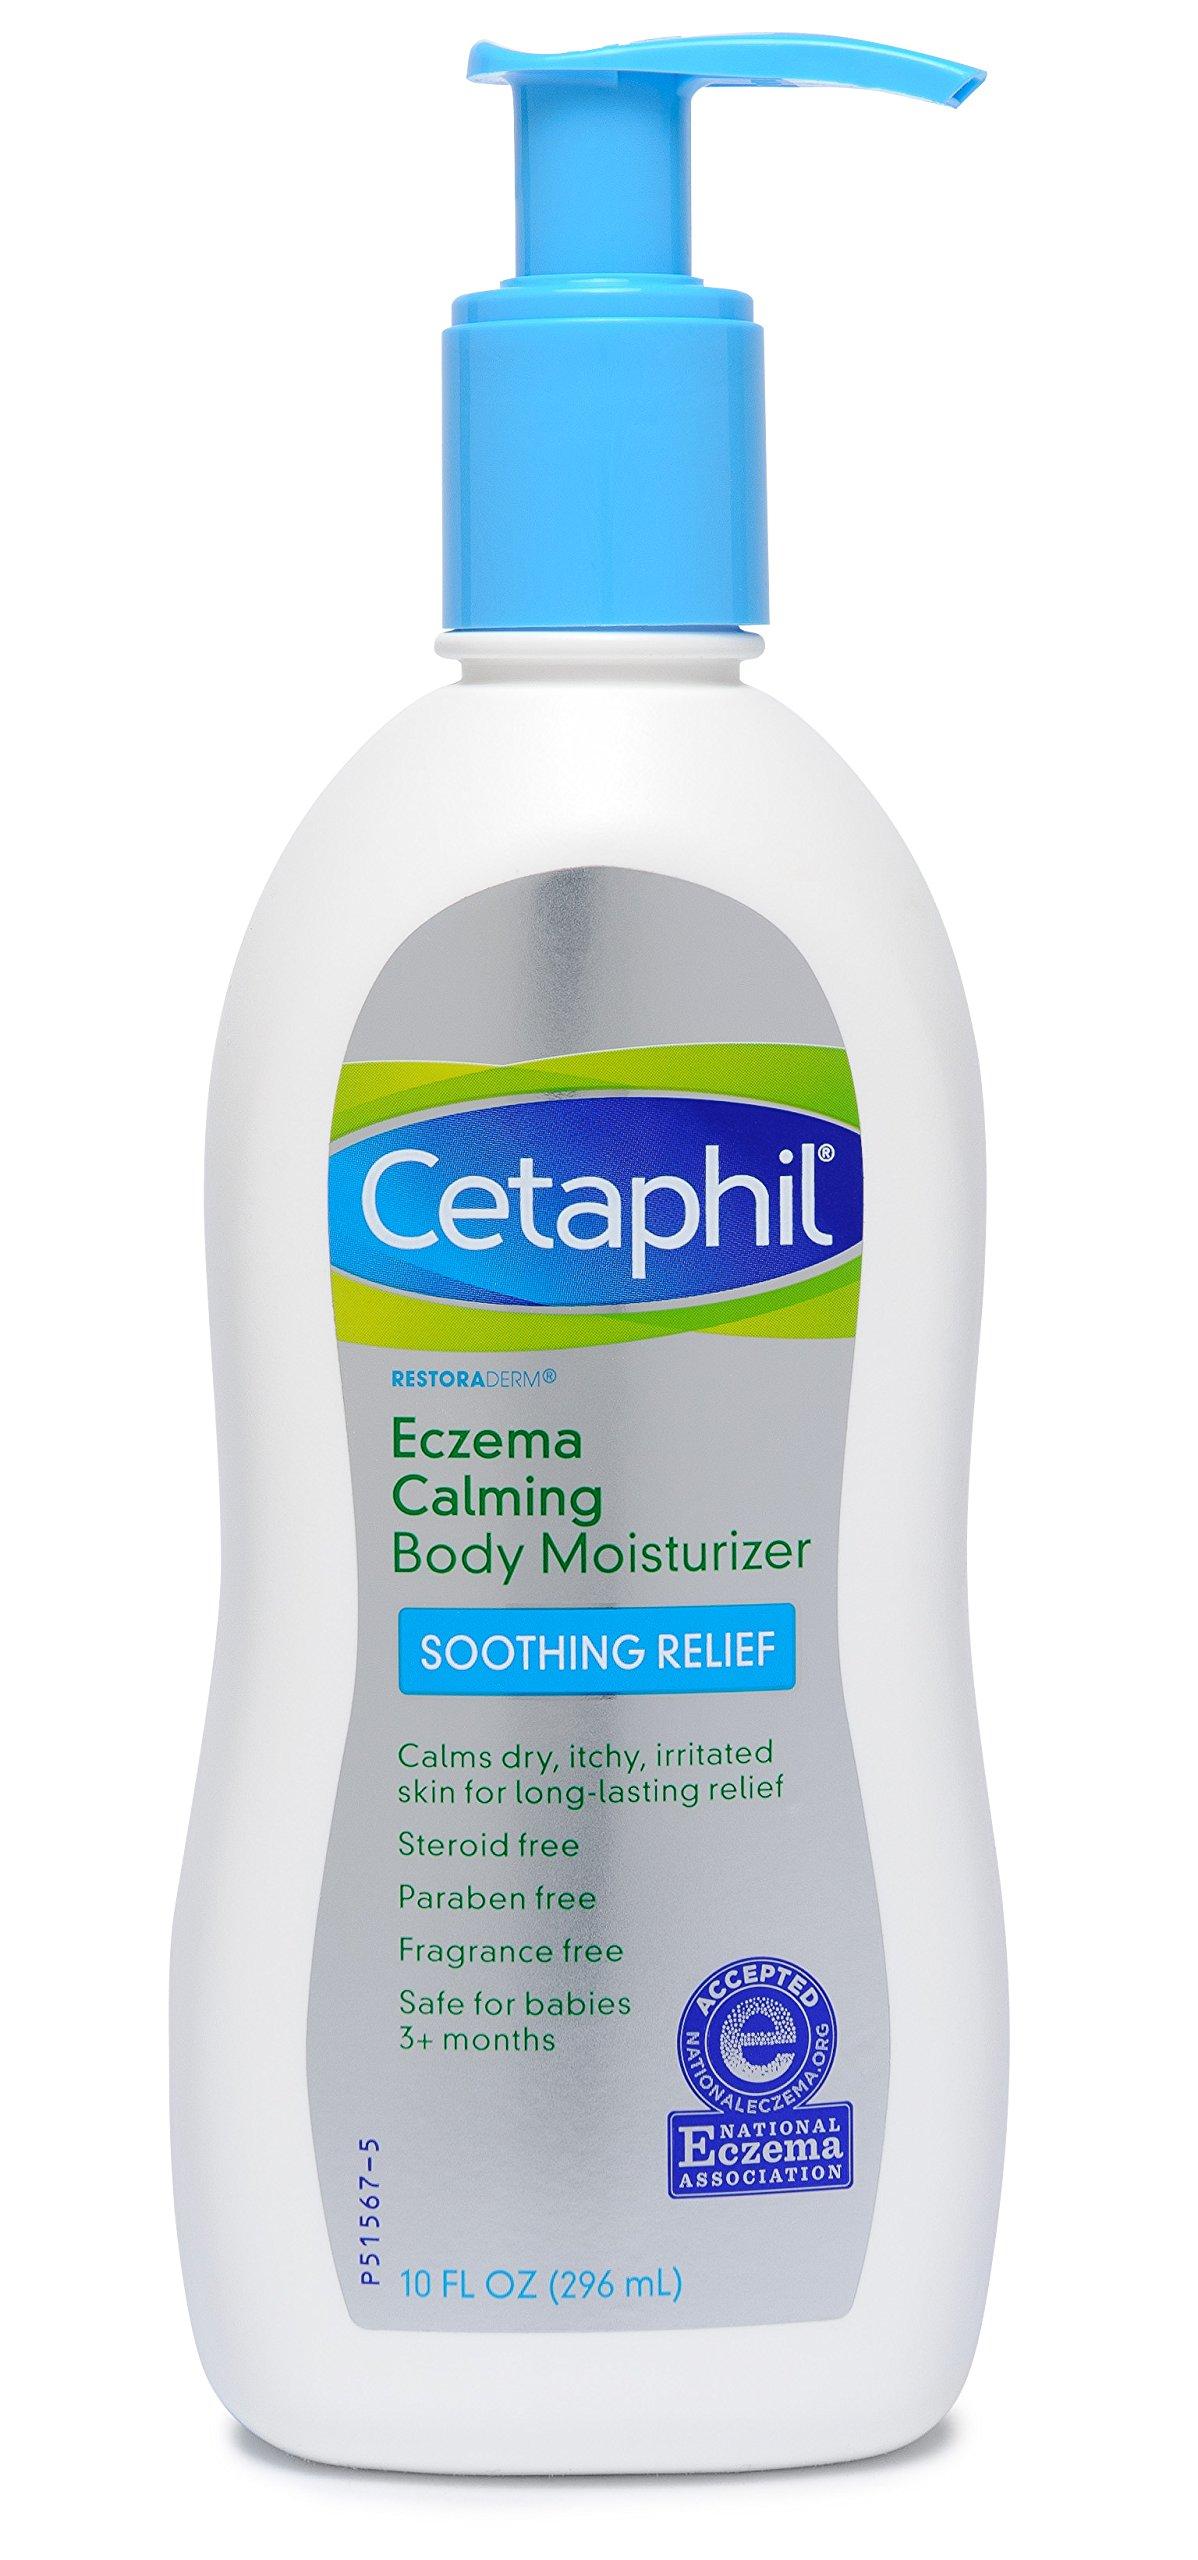 Cetaphil Restoraderm Eczema Calming Body Moisturizer 10